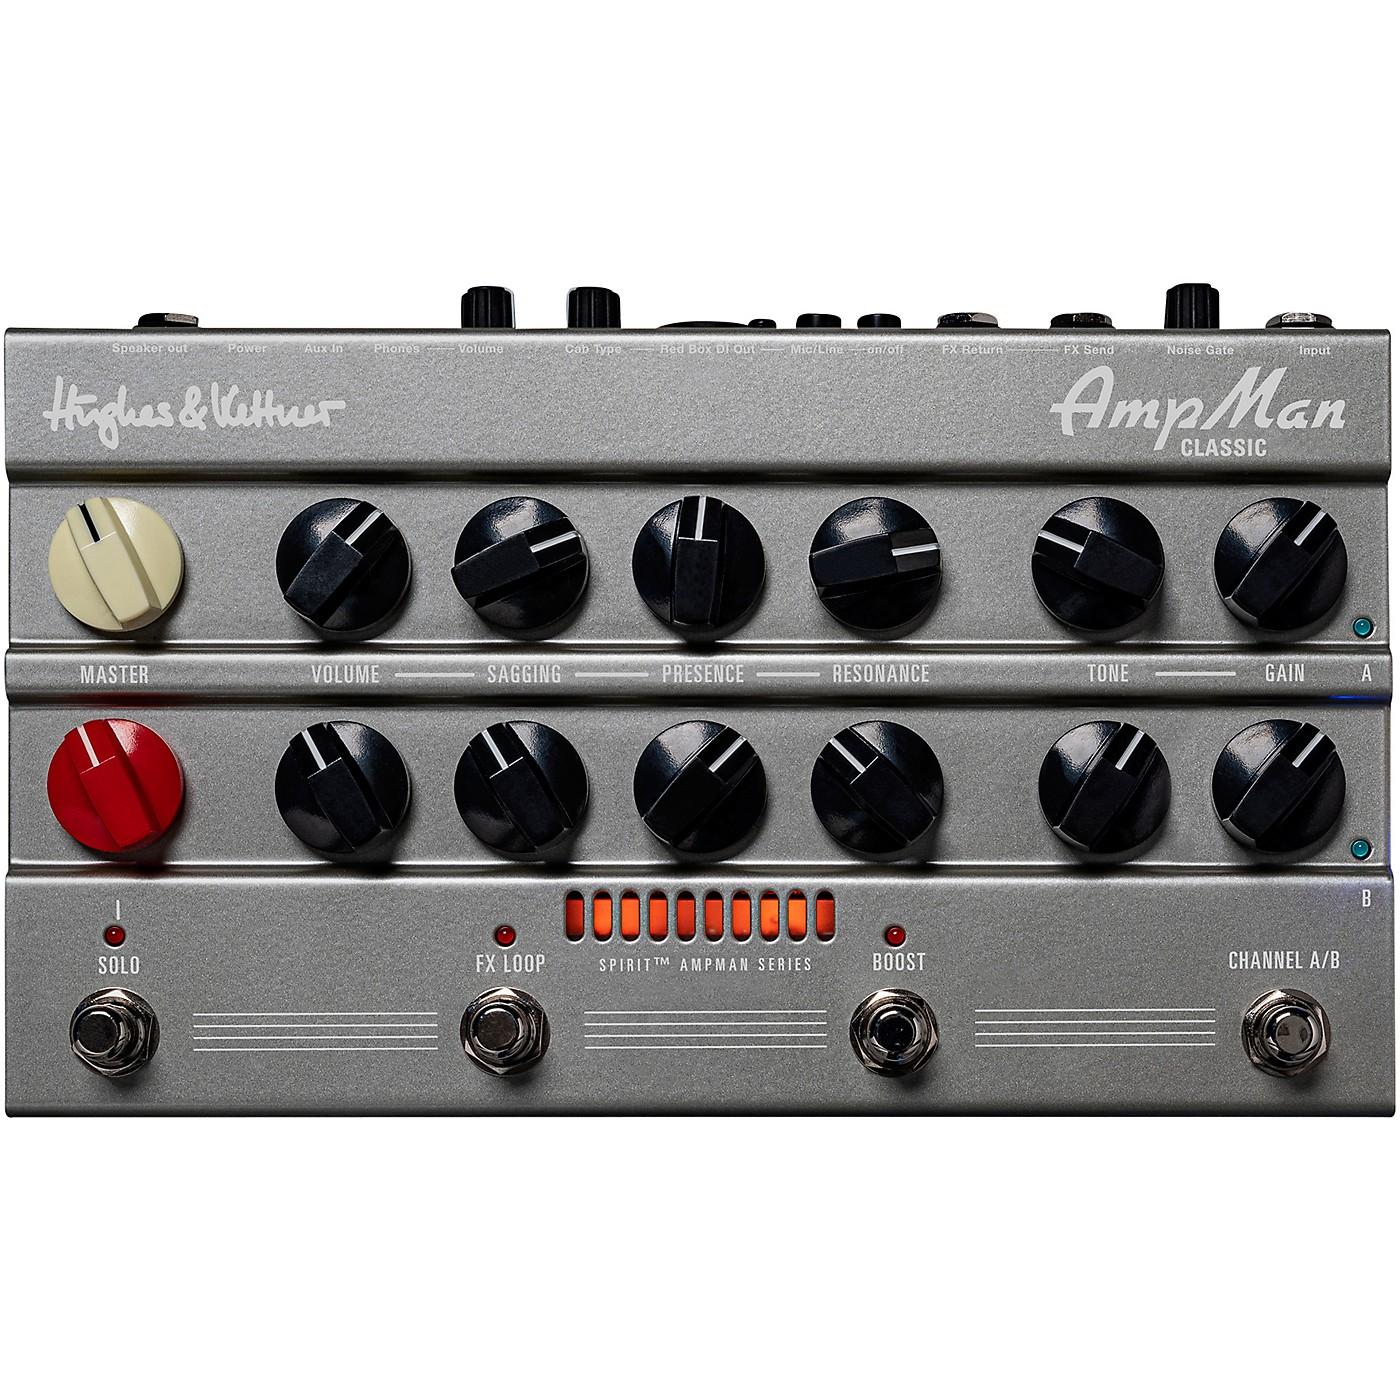 Hughes & Kettner Two Channel 50watt Classic tone pedalamp. F/X loop, Redbox AE+, Headphone out thumbnail